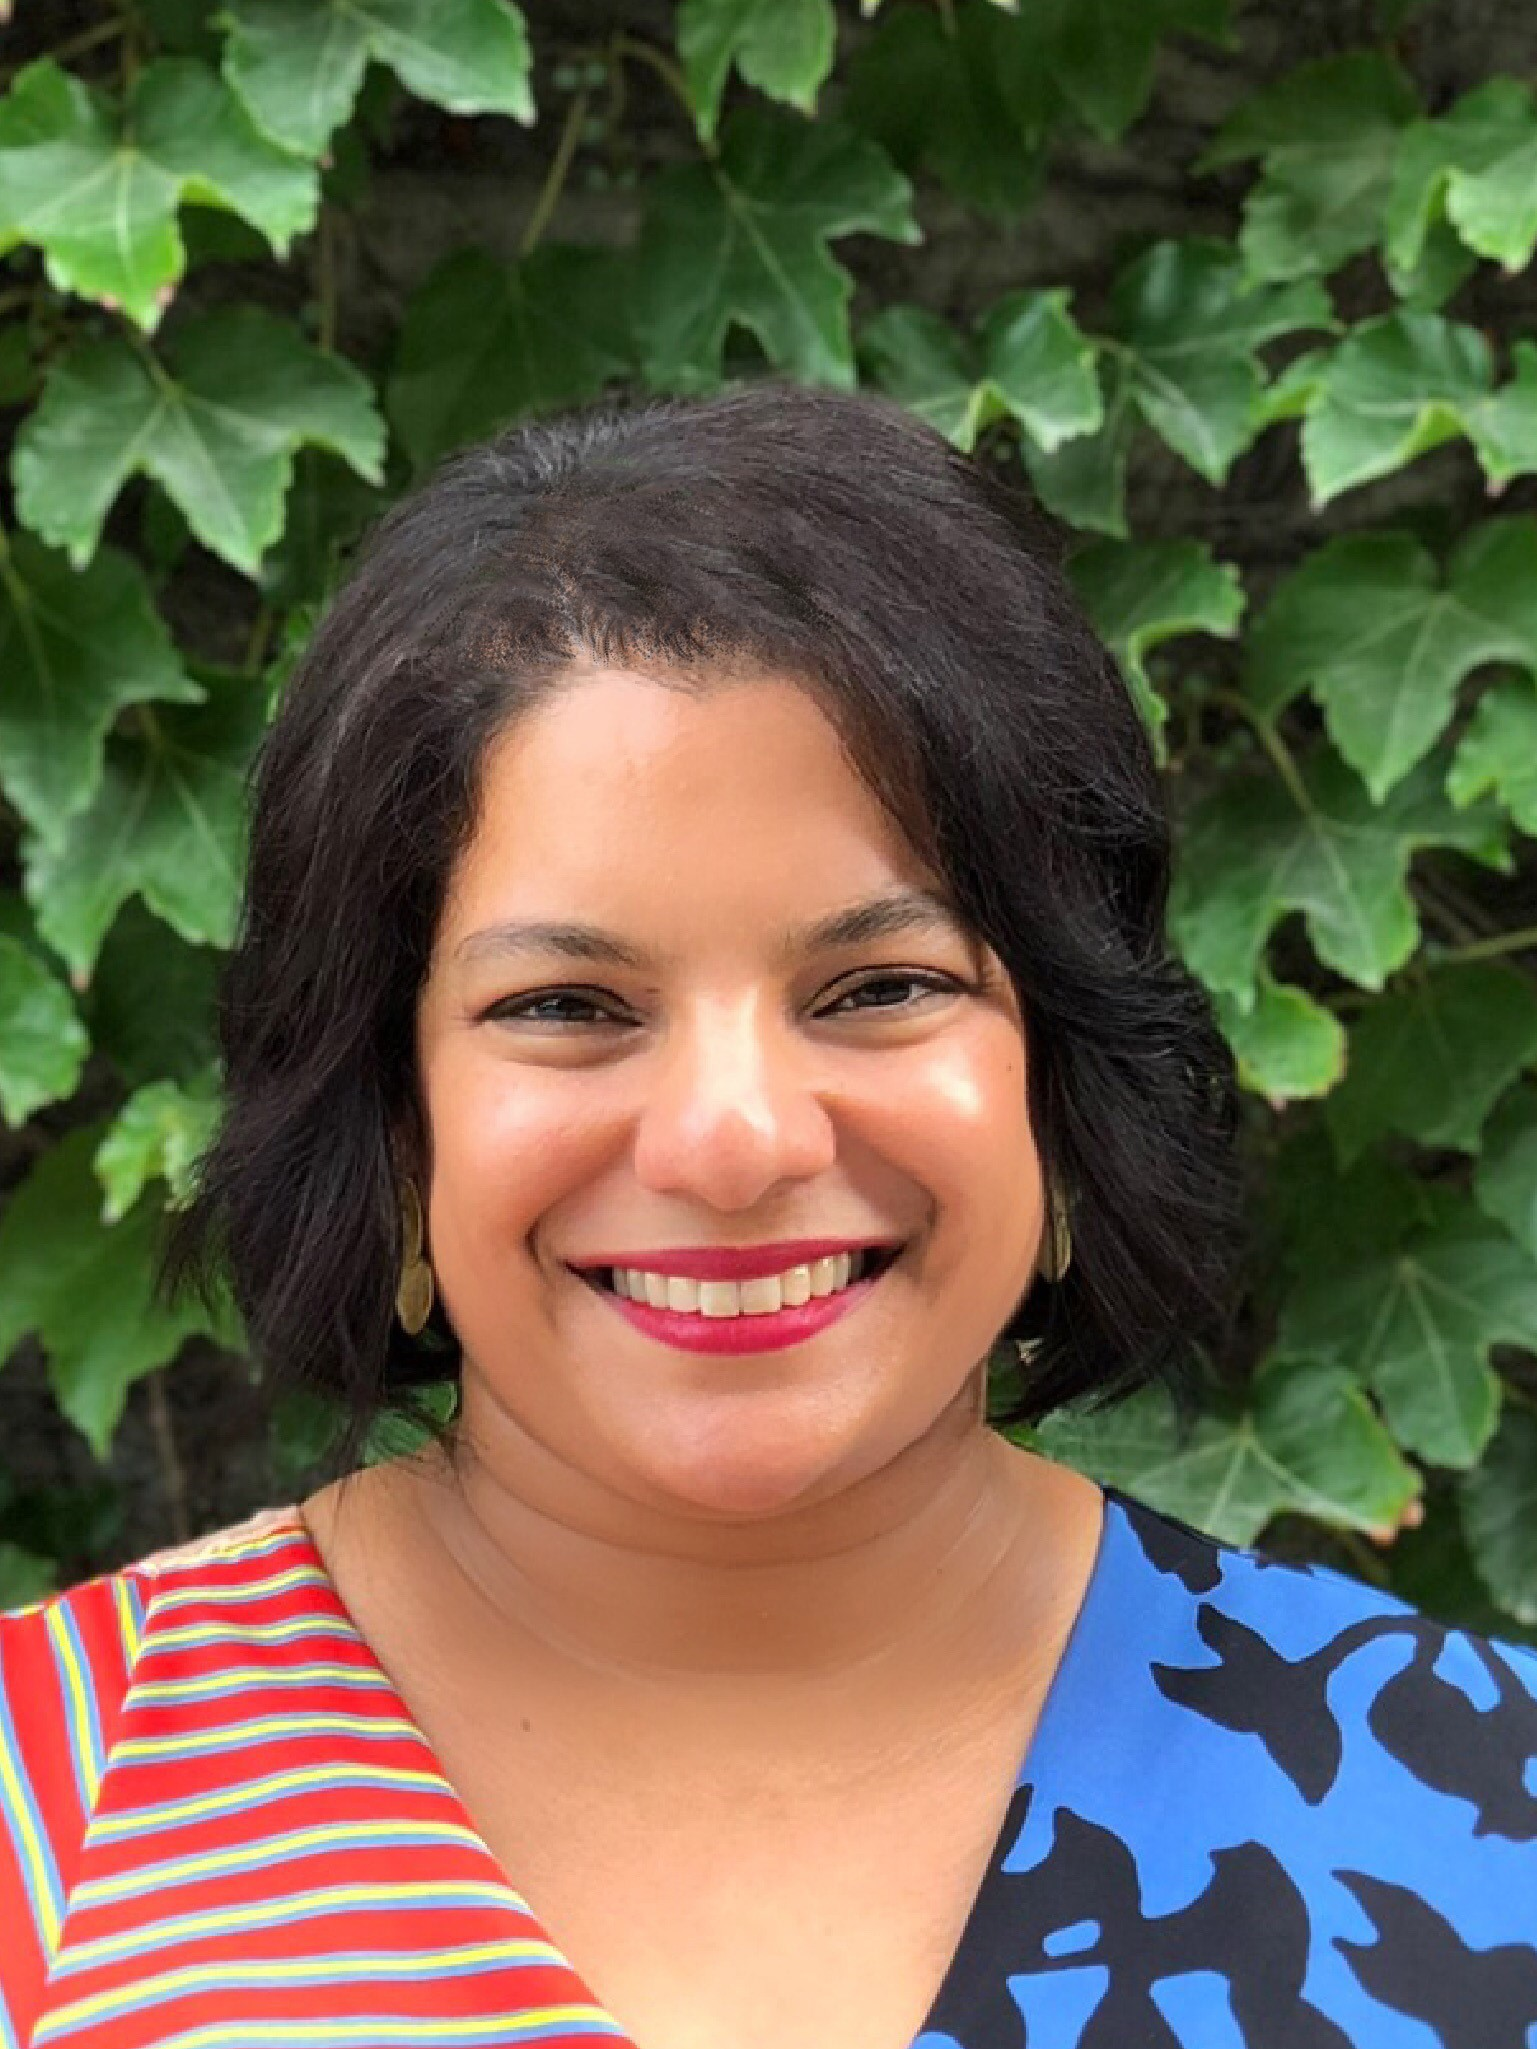 Maya Kuzalti, founder, Sipscouts, woman in data